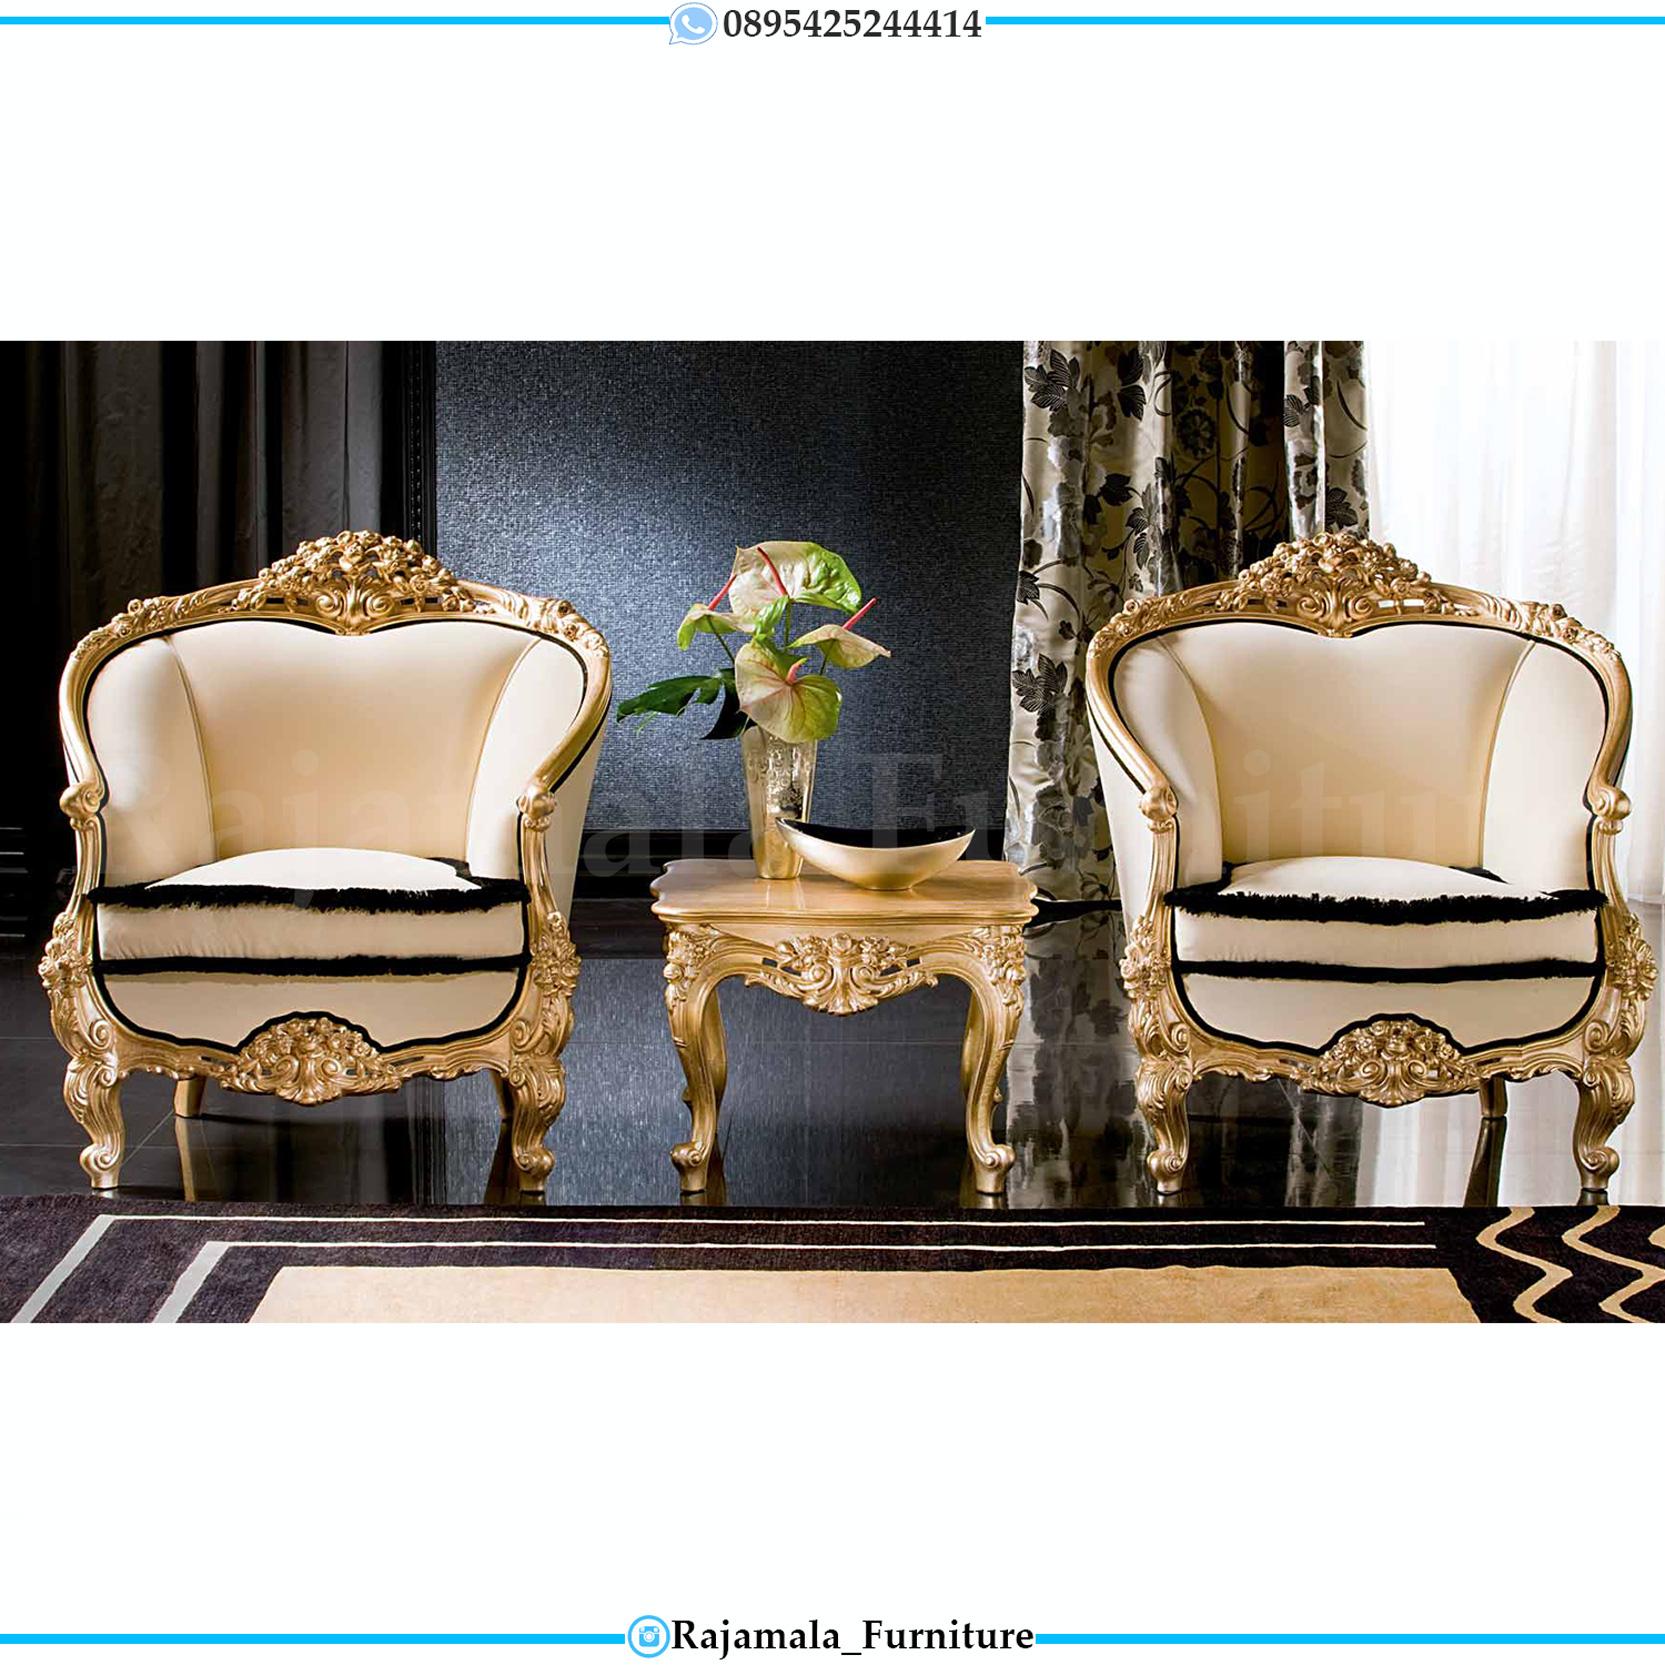 Kursi Teras Mewah, Coffee Table Luxury Classic Carving Jepara RM-0021